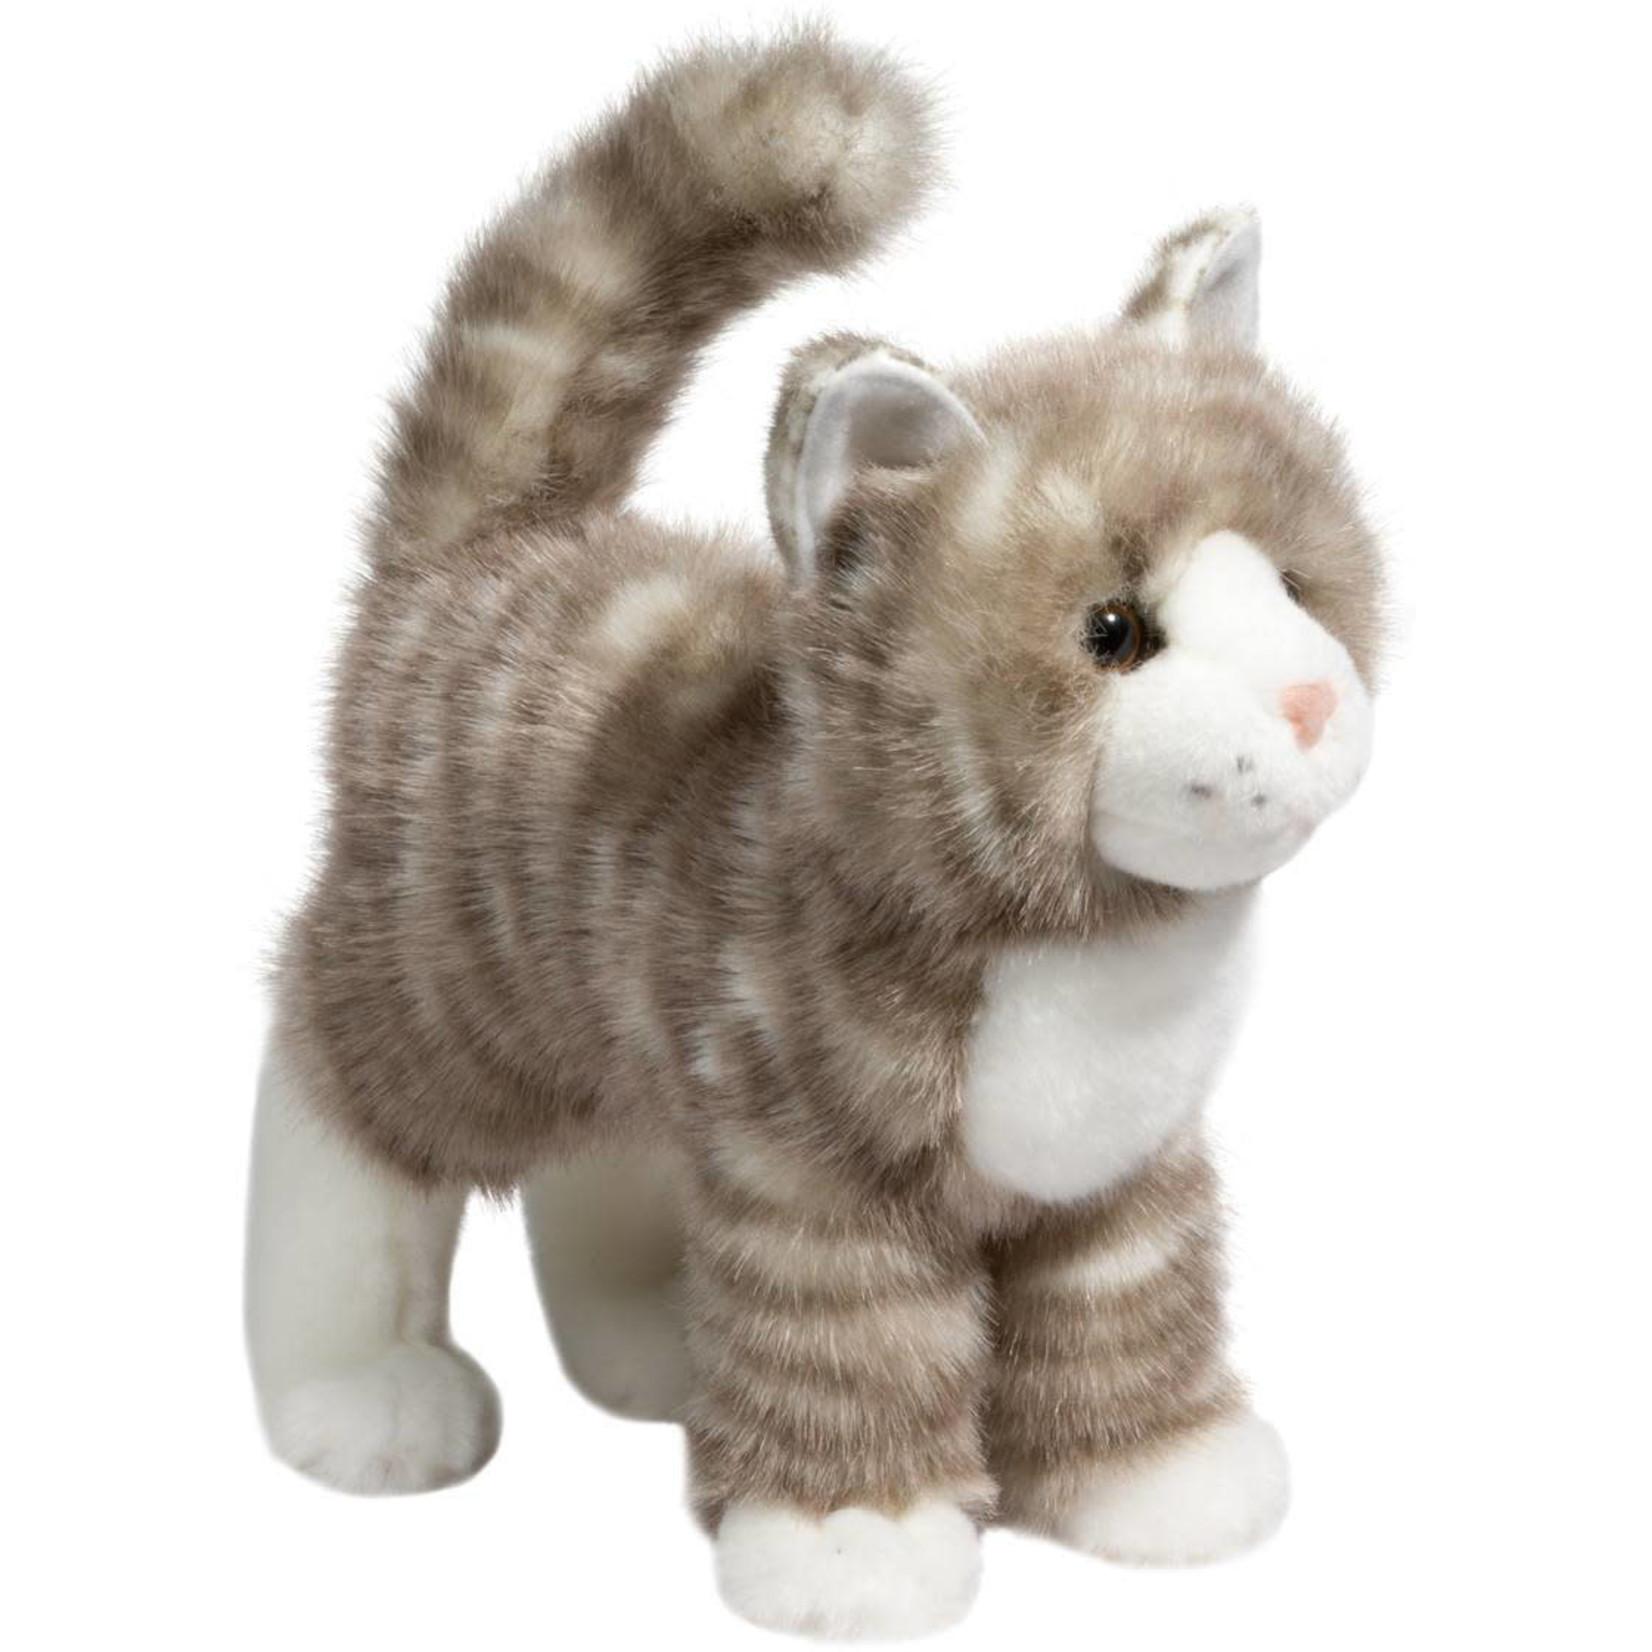 DOUGLAS ZIPPER GRAY TABBY CAT